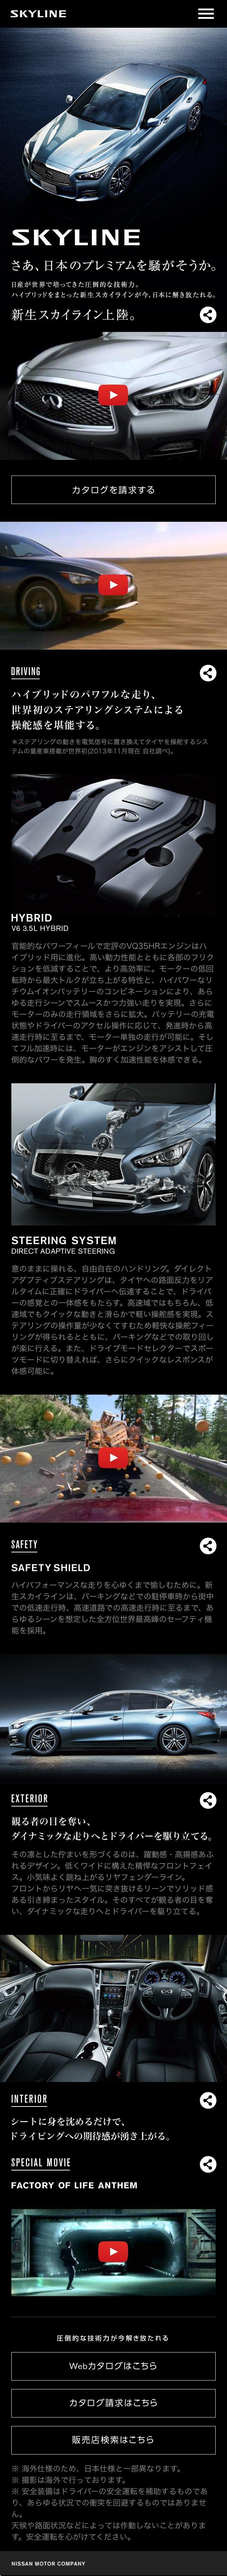 http://www.nissan.co.jp/SKYLINE/SUMMARY/SP/